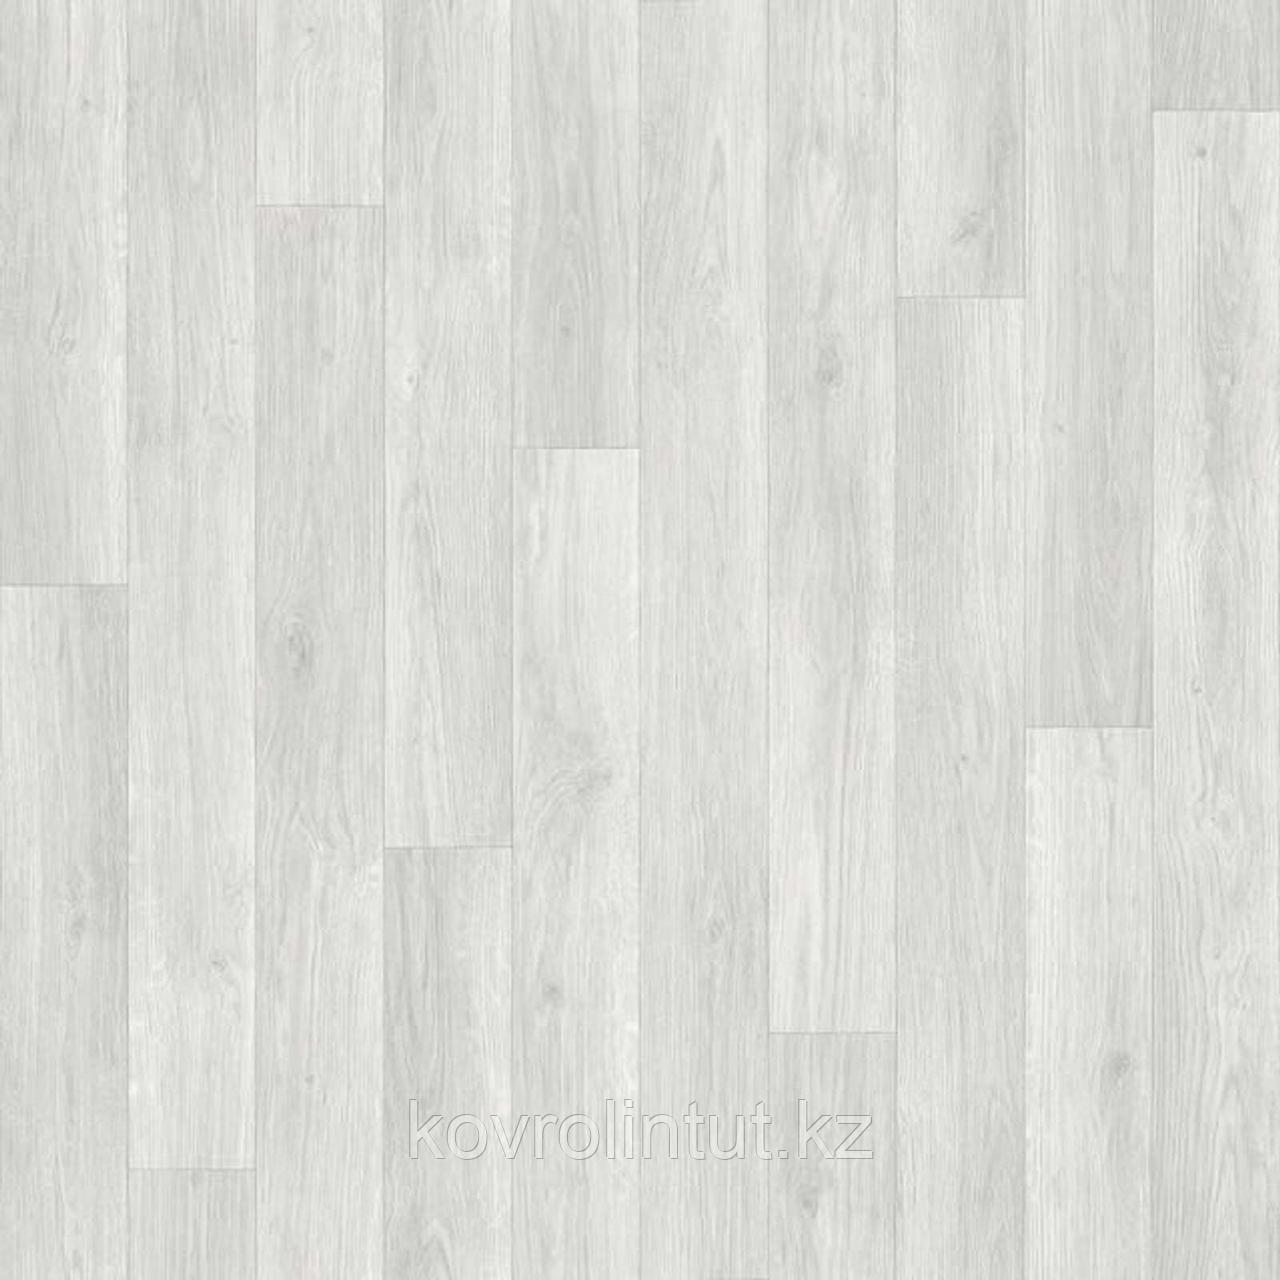 Линолеум коммерческий Acczent Pro Berne 1 3,0 м